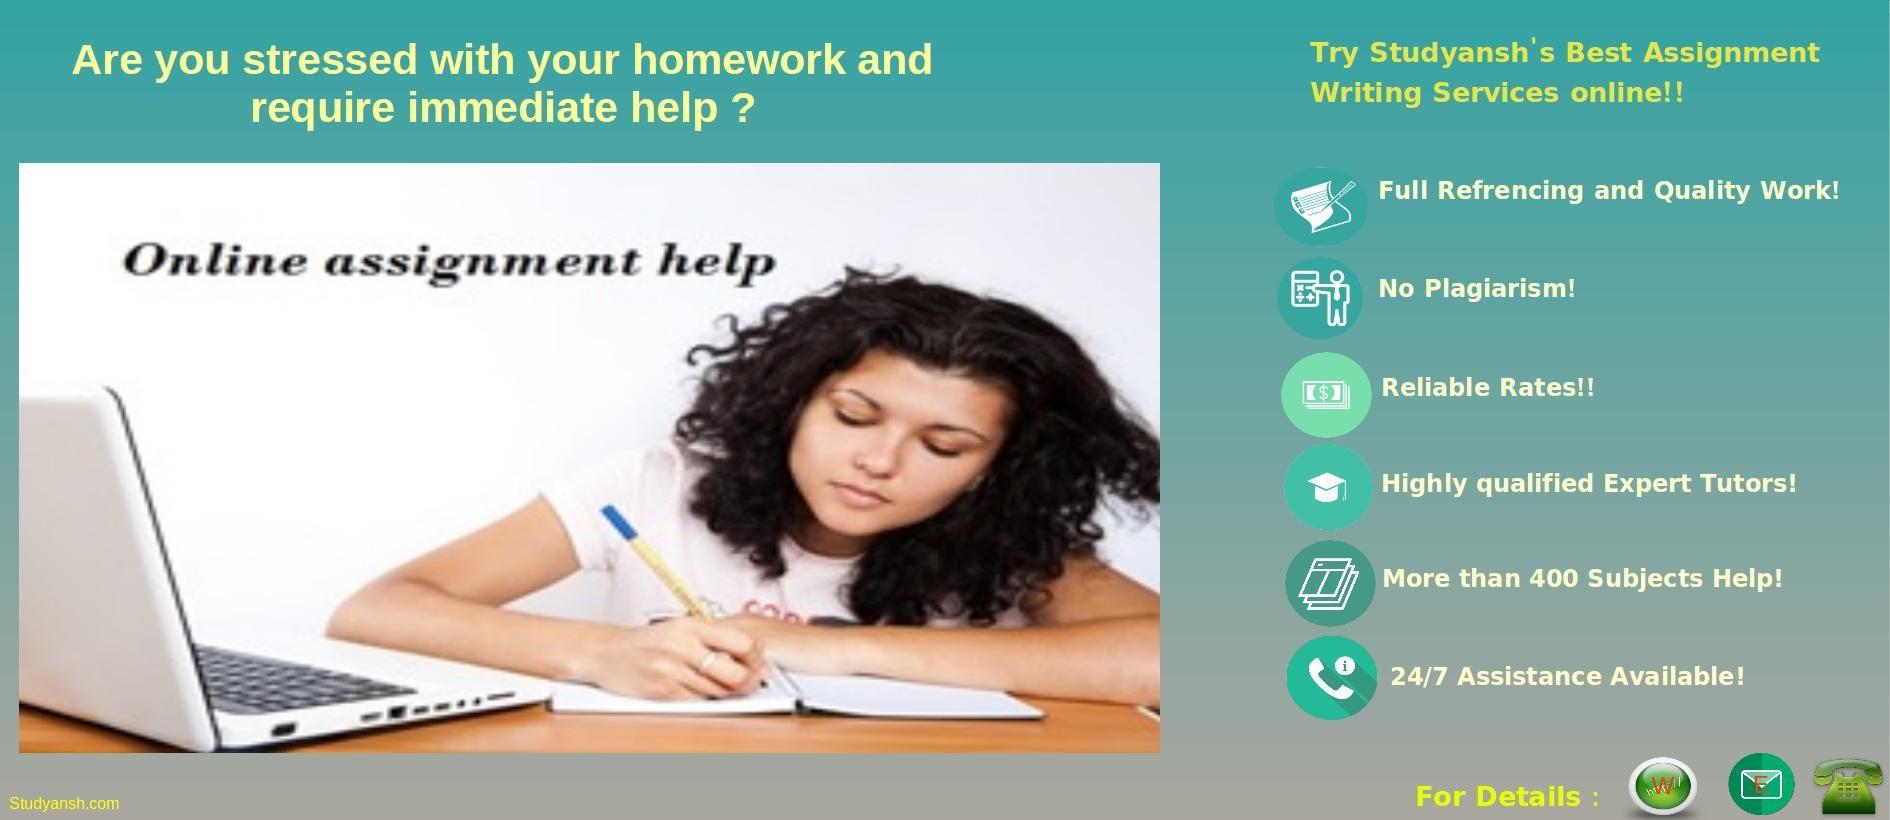 Get Best Assignment Help Services At Studyansh At Most Reliable  Get Best Assignment Help Services At Studyansh At Most Reliable Rates